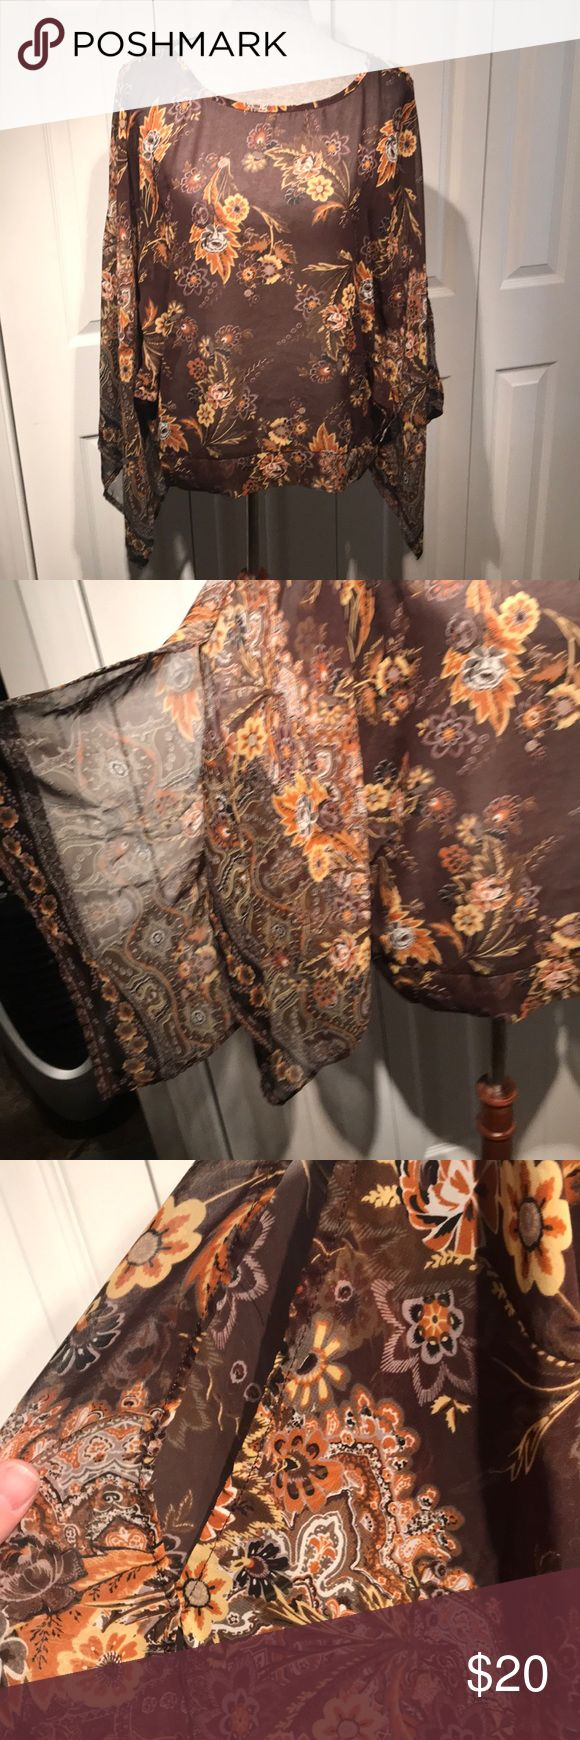 Boho, batwing cold shoulder sheer floral top Cute boho top with batwings and cold shoulder. Sheer. Size M Chenauli Tops Blouses